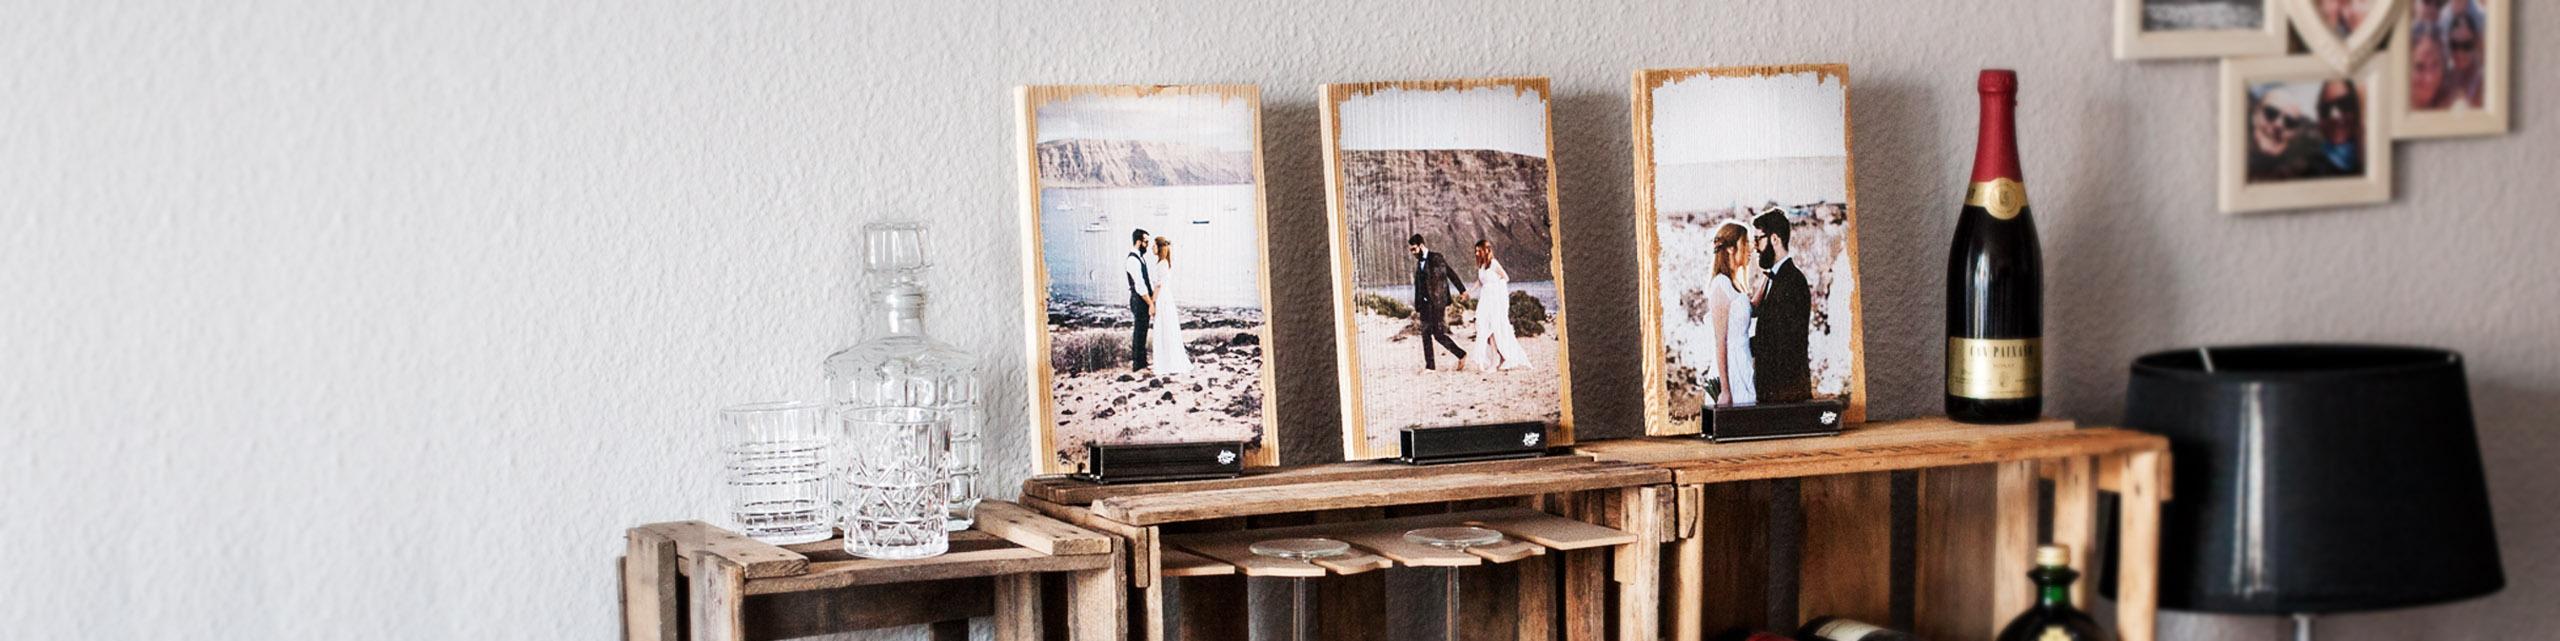 LumberPrint Holzdruck foto auf holz altholz fotodruck